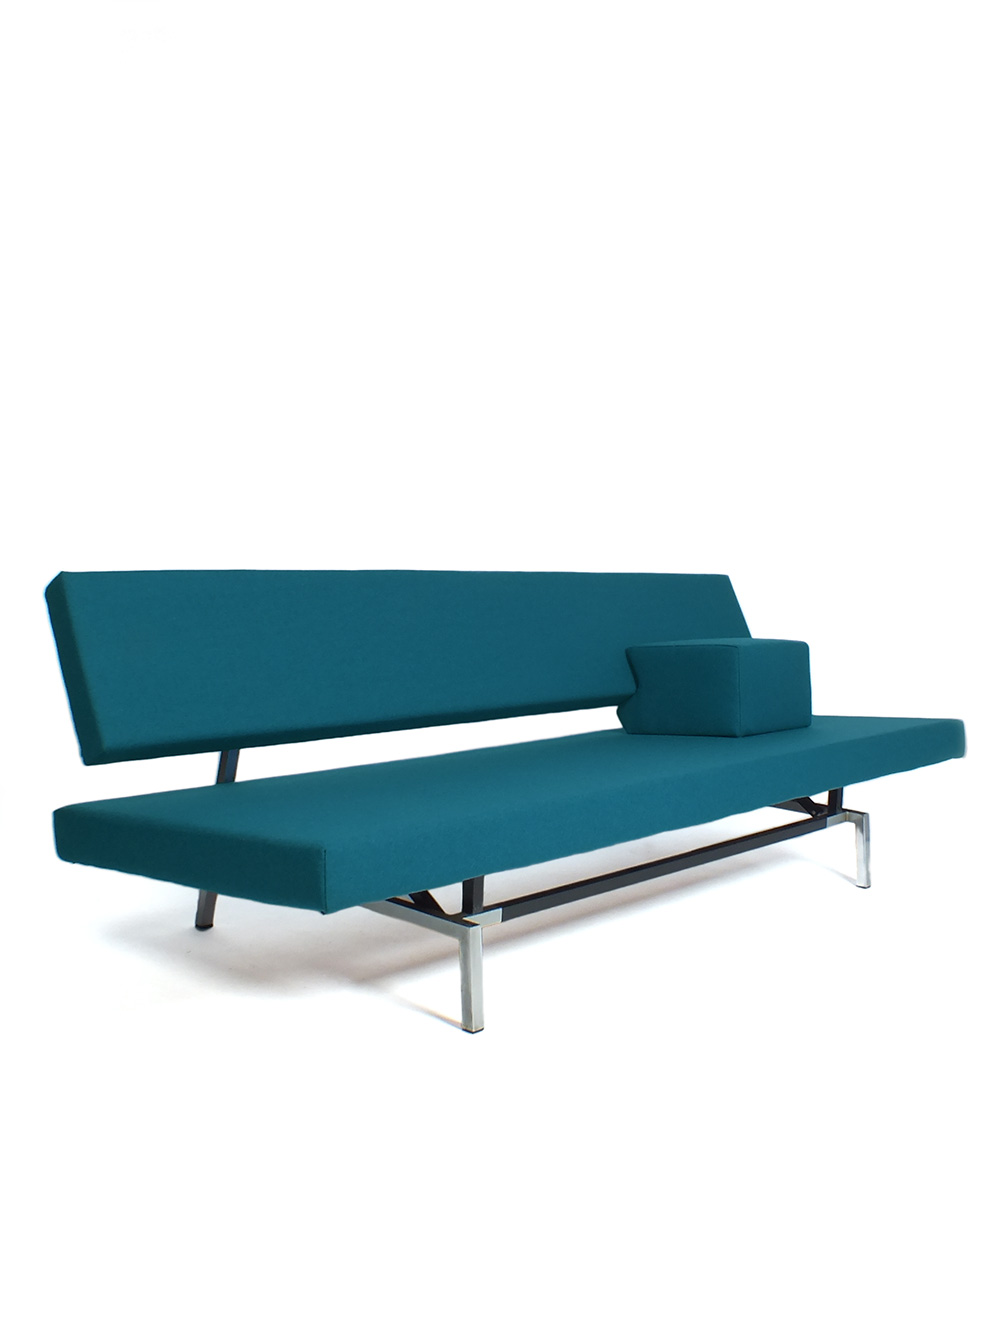 Seats And Sofas Slaapbank.Sofa Bed Br03 Martin Visser T Spectrum Vaen